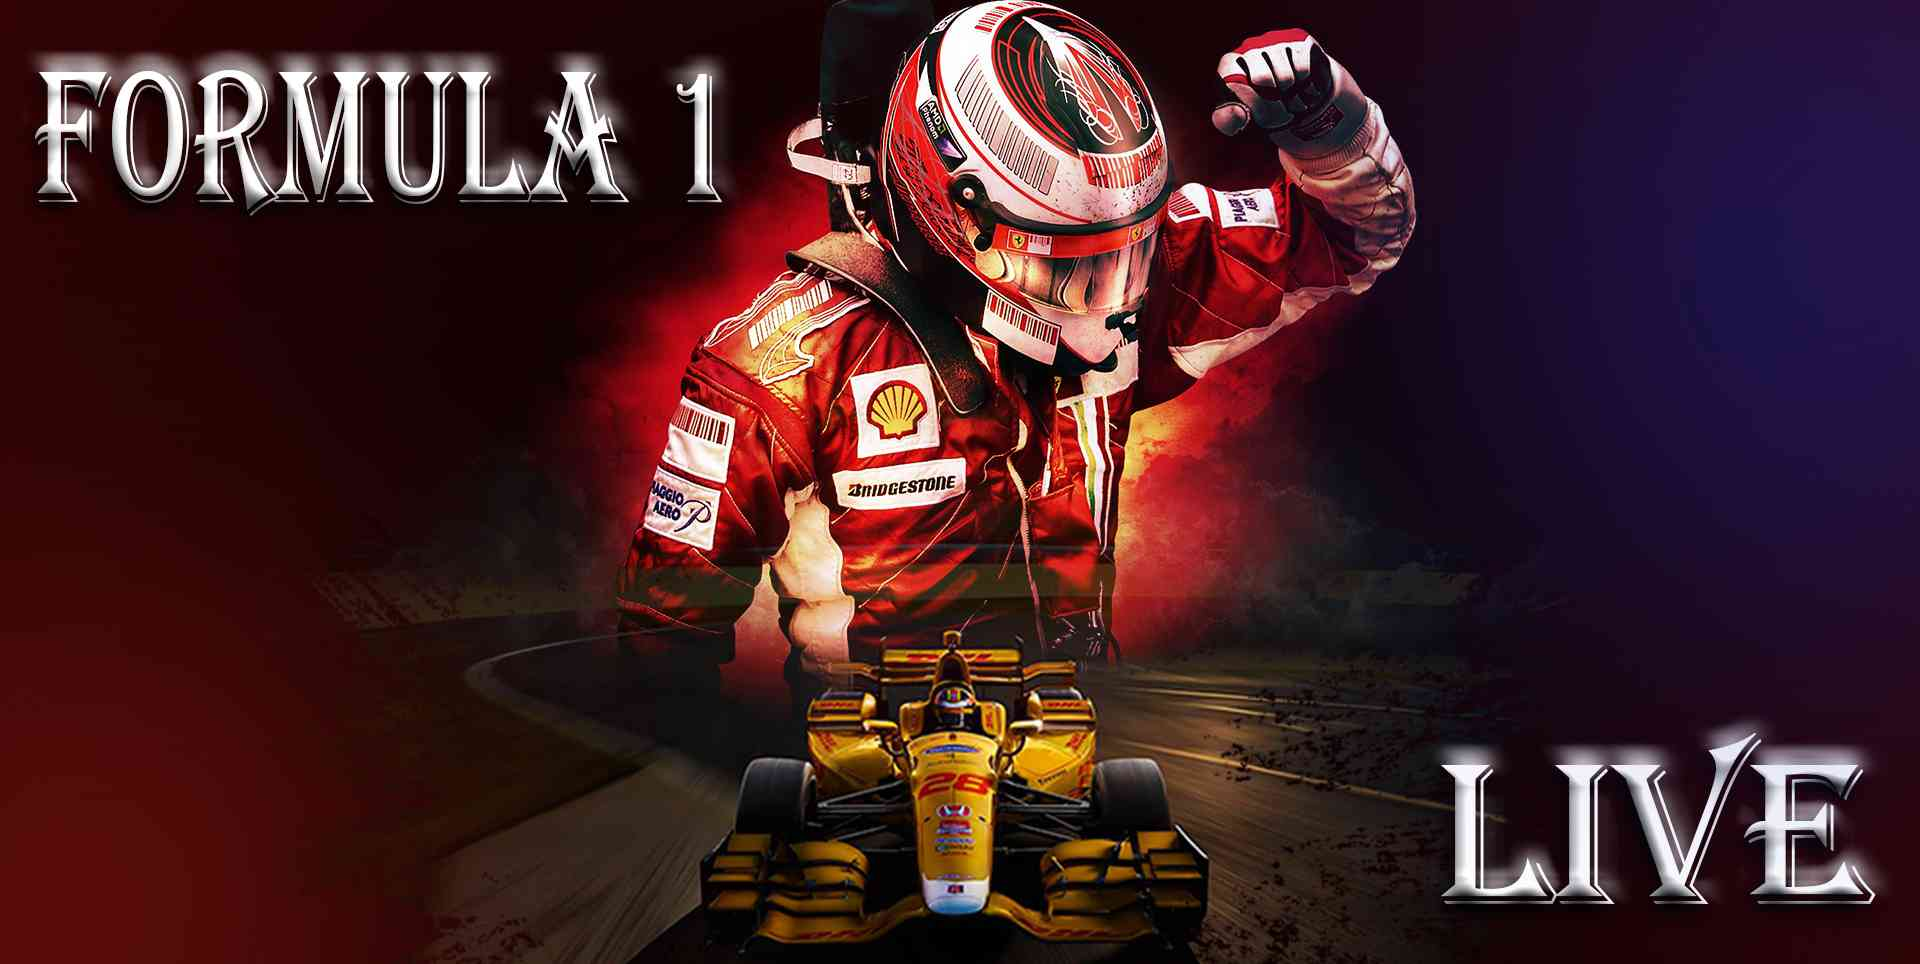 Austrian GP3 Grand Prix 2016 Live Stream